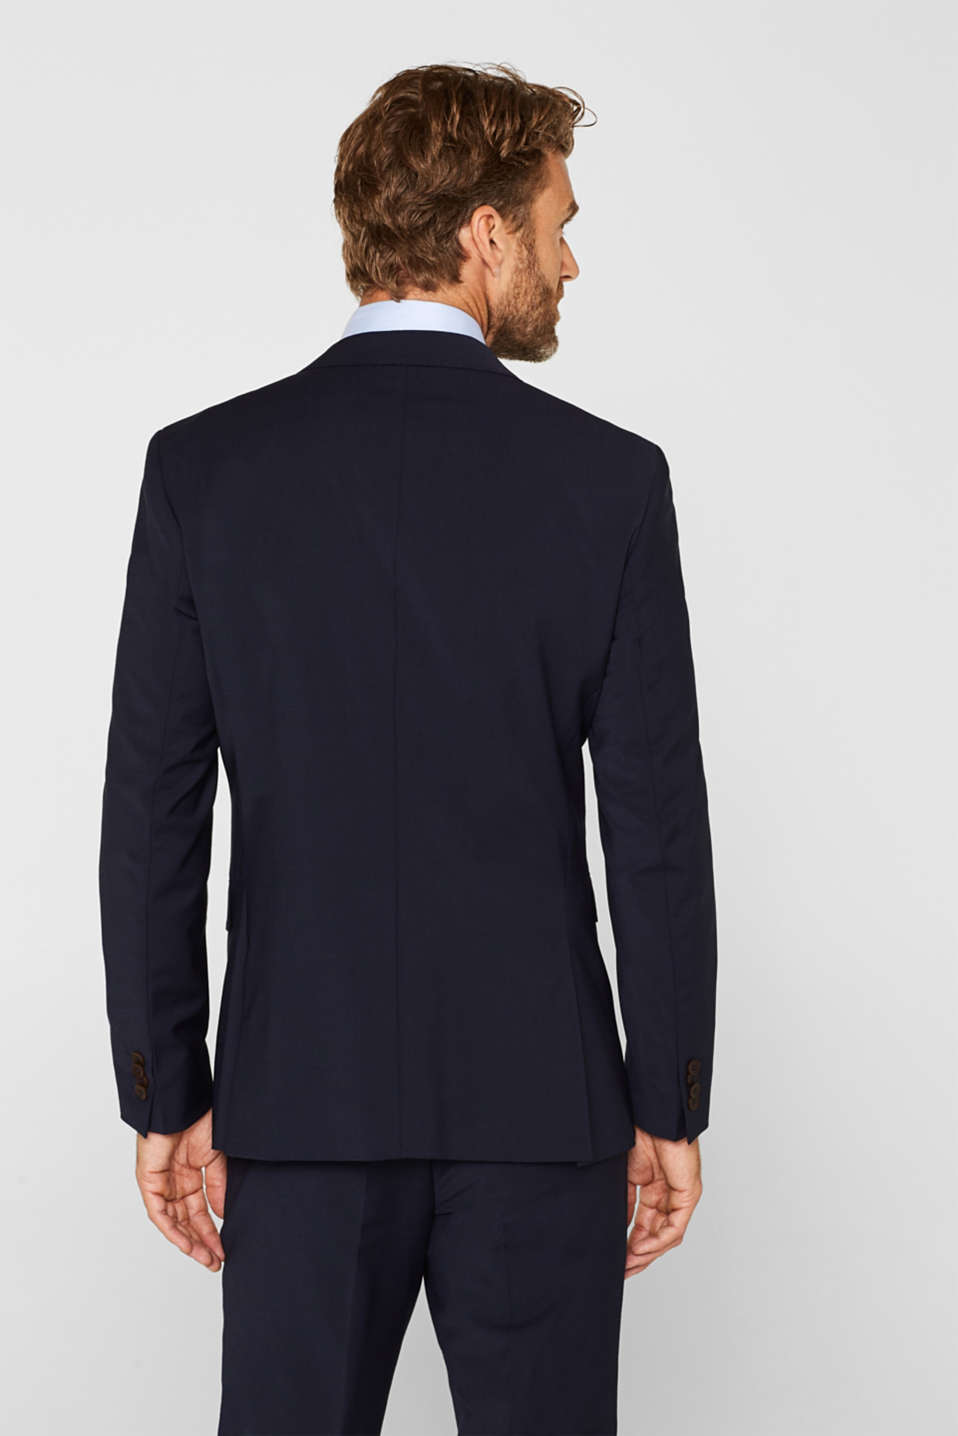 Blazers suit, NAVY, detail image number 3